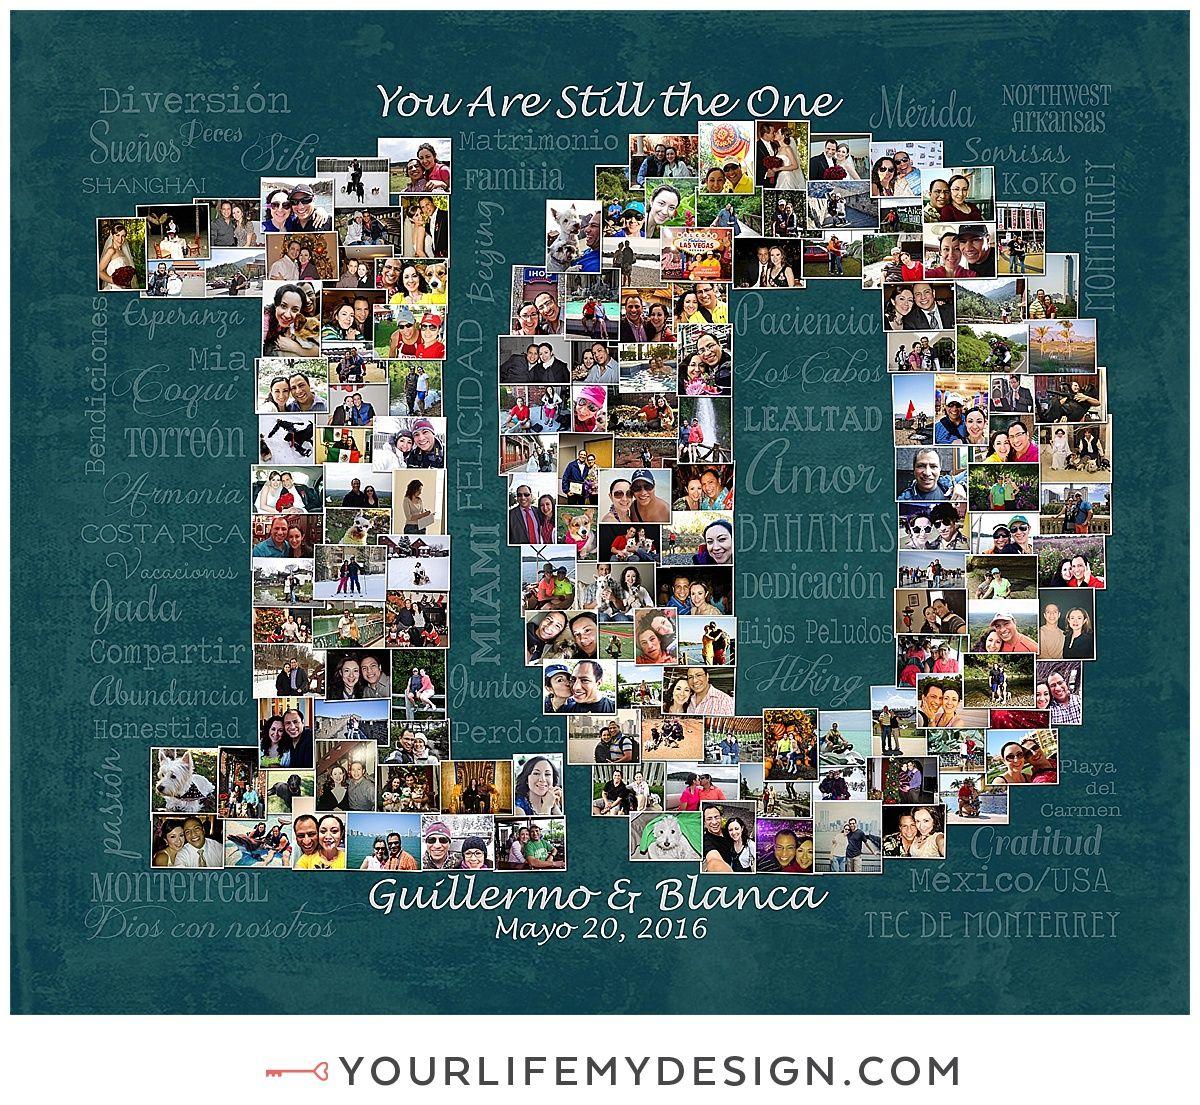 20x24 With 151 Photos 10 Year Anniversary Collage Website 20 GiftsAnniversary DinnerAnniversary IdeasWedding